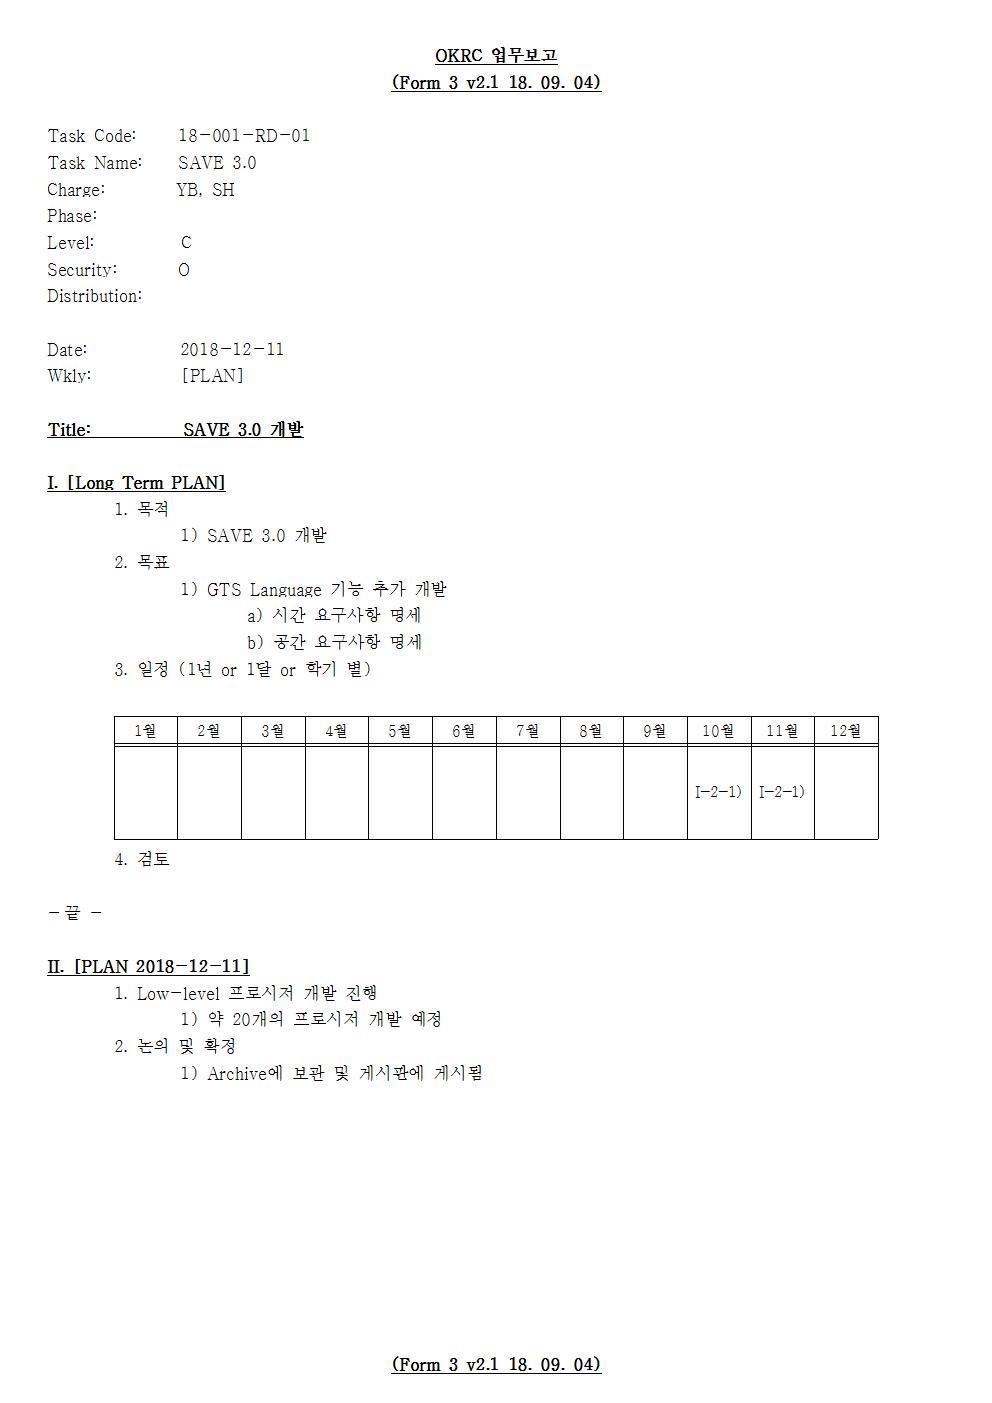 D-[18-001-RD-01]-[SAVE 3.0]-[2018-12-11][SH]001.jpg